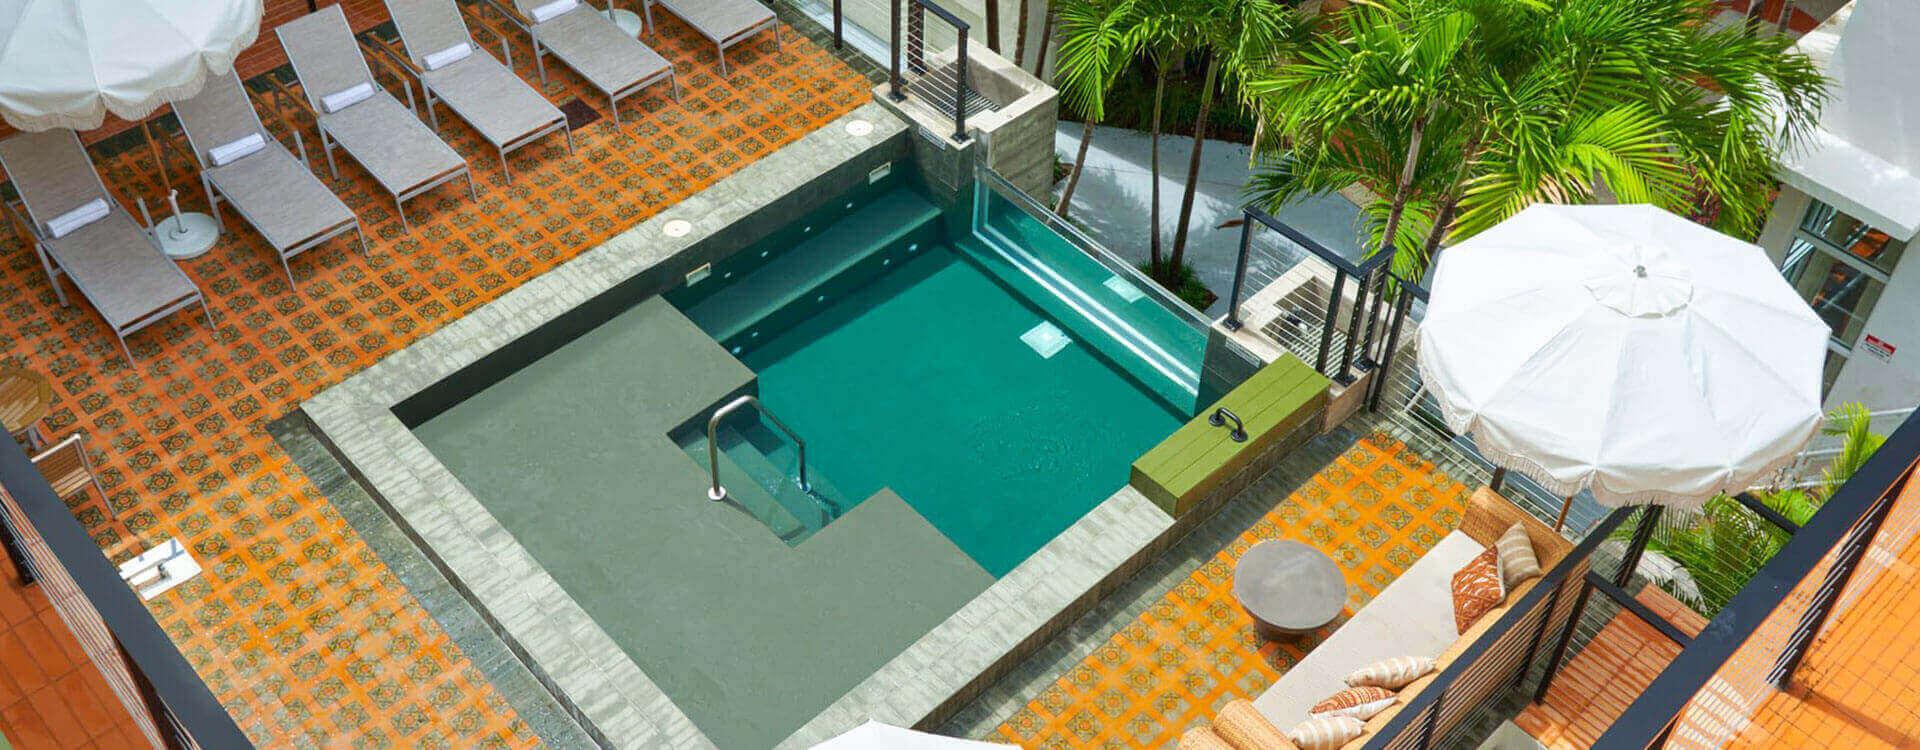 Pool at Balfour Hotel, Miami beach